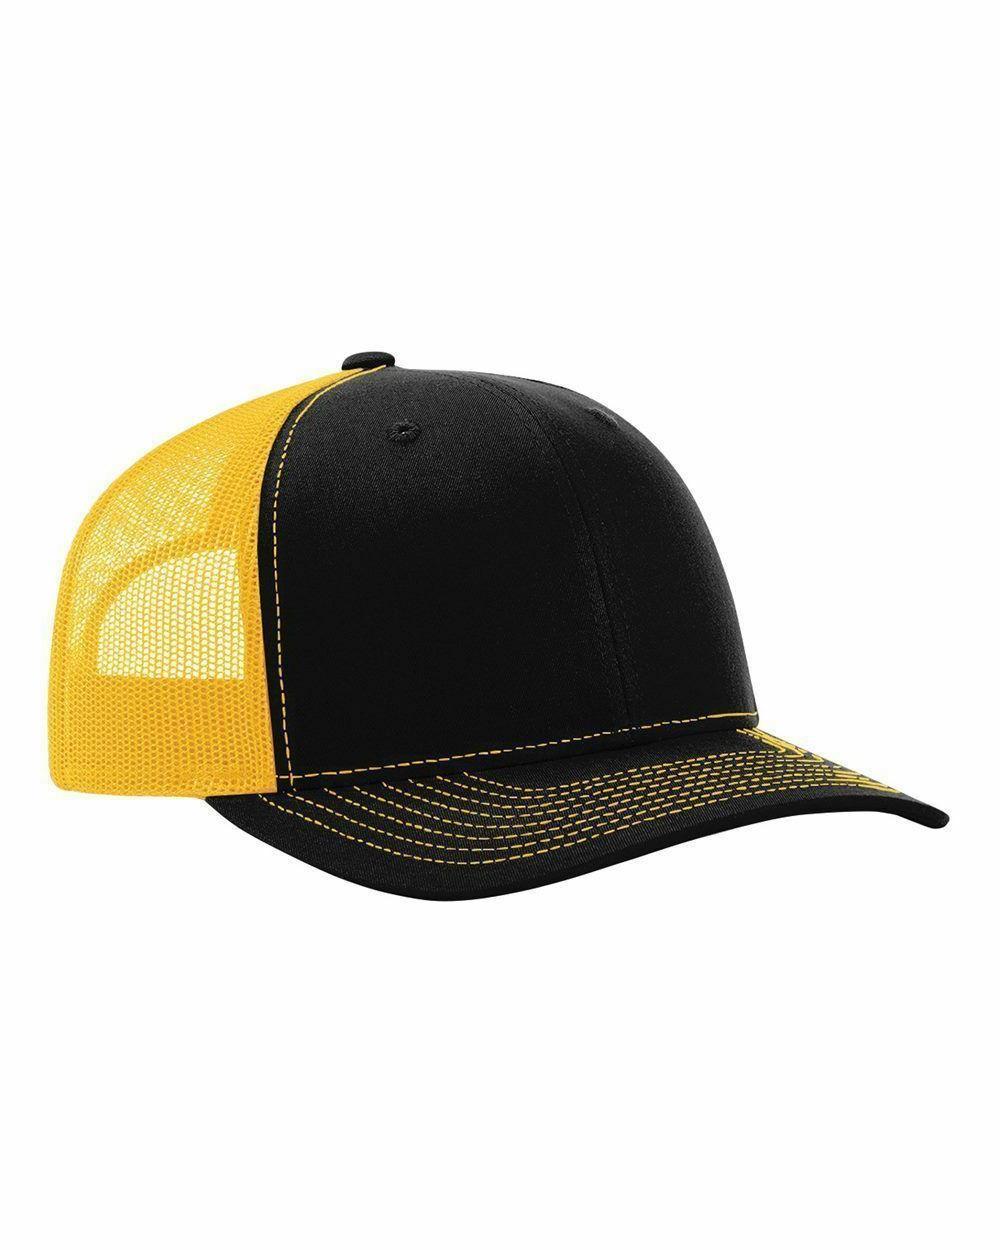 $1.99 New Richardson Trucker Baseball Hat Cap